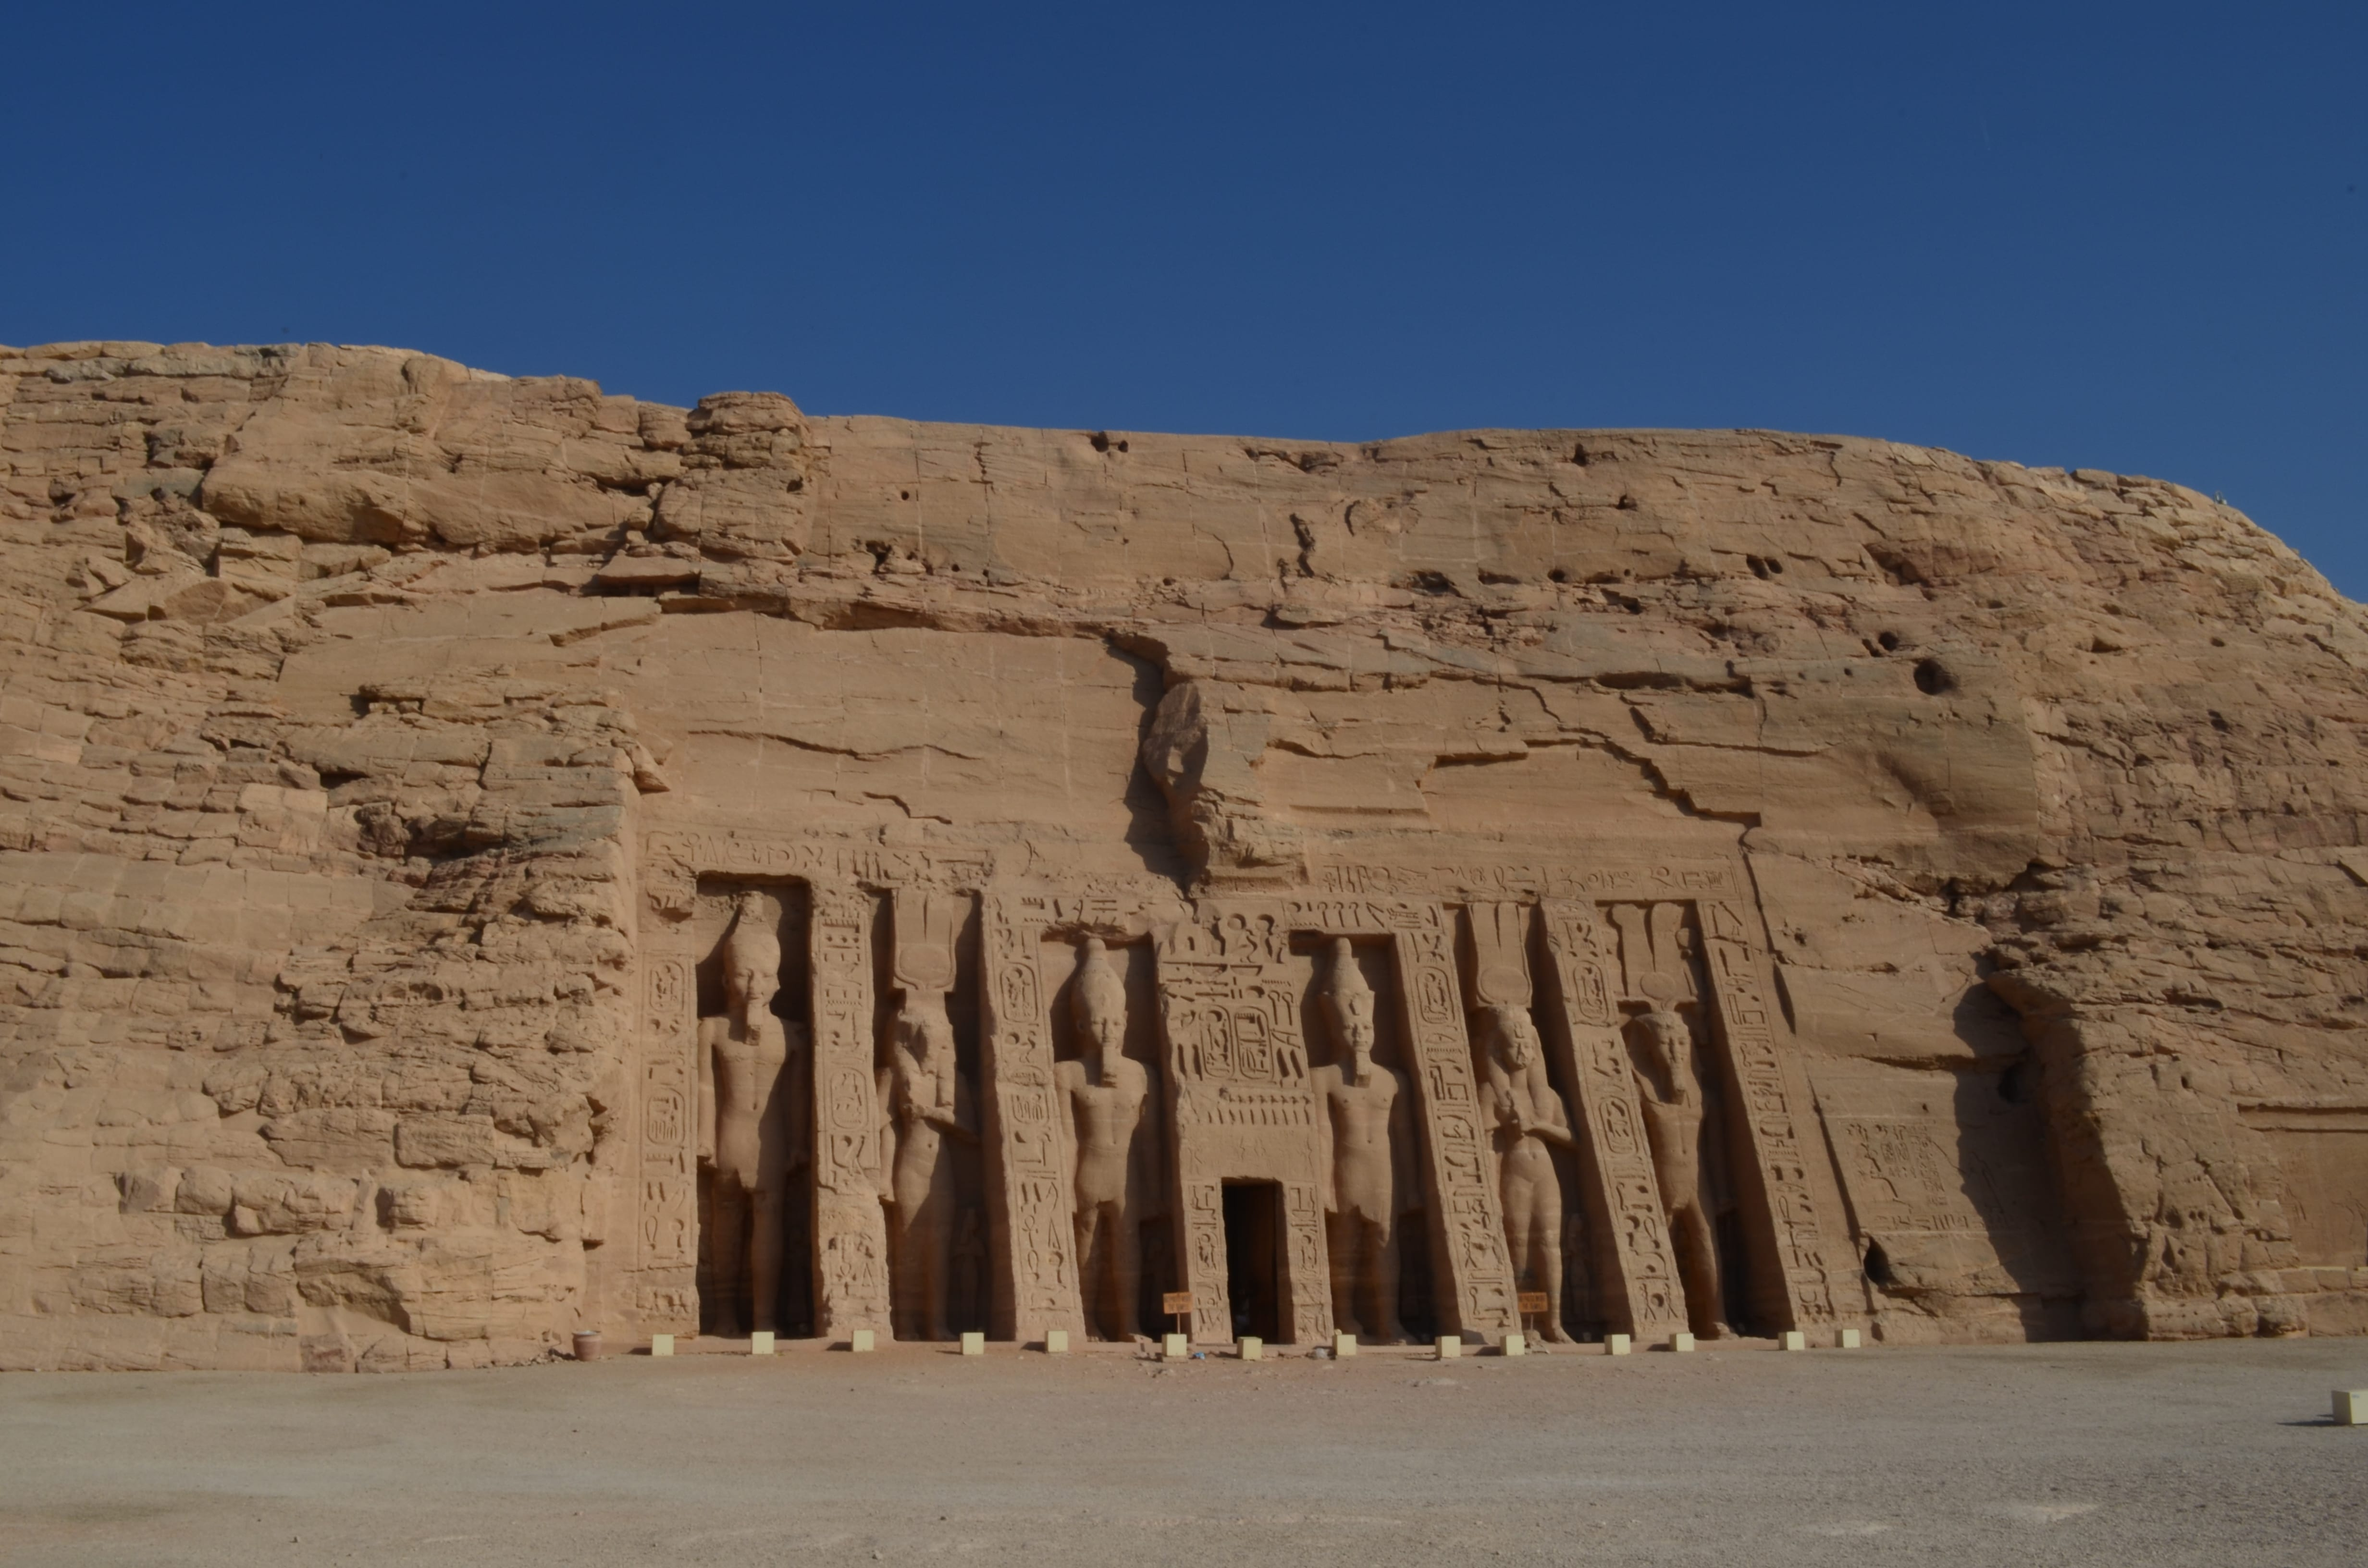 El templo de Nefertari al Sur de Egipto